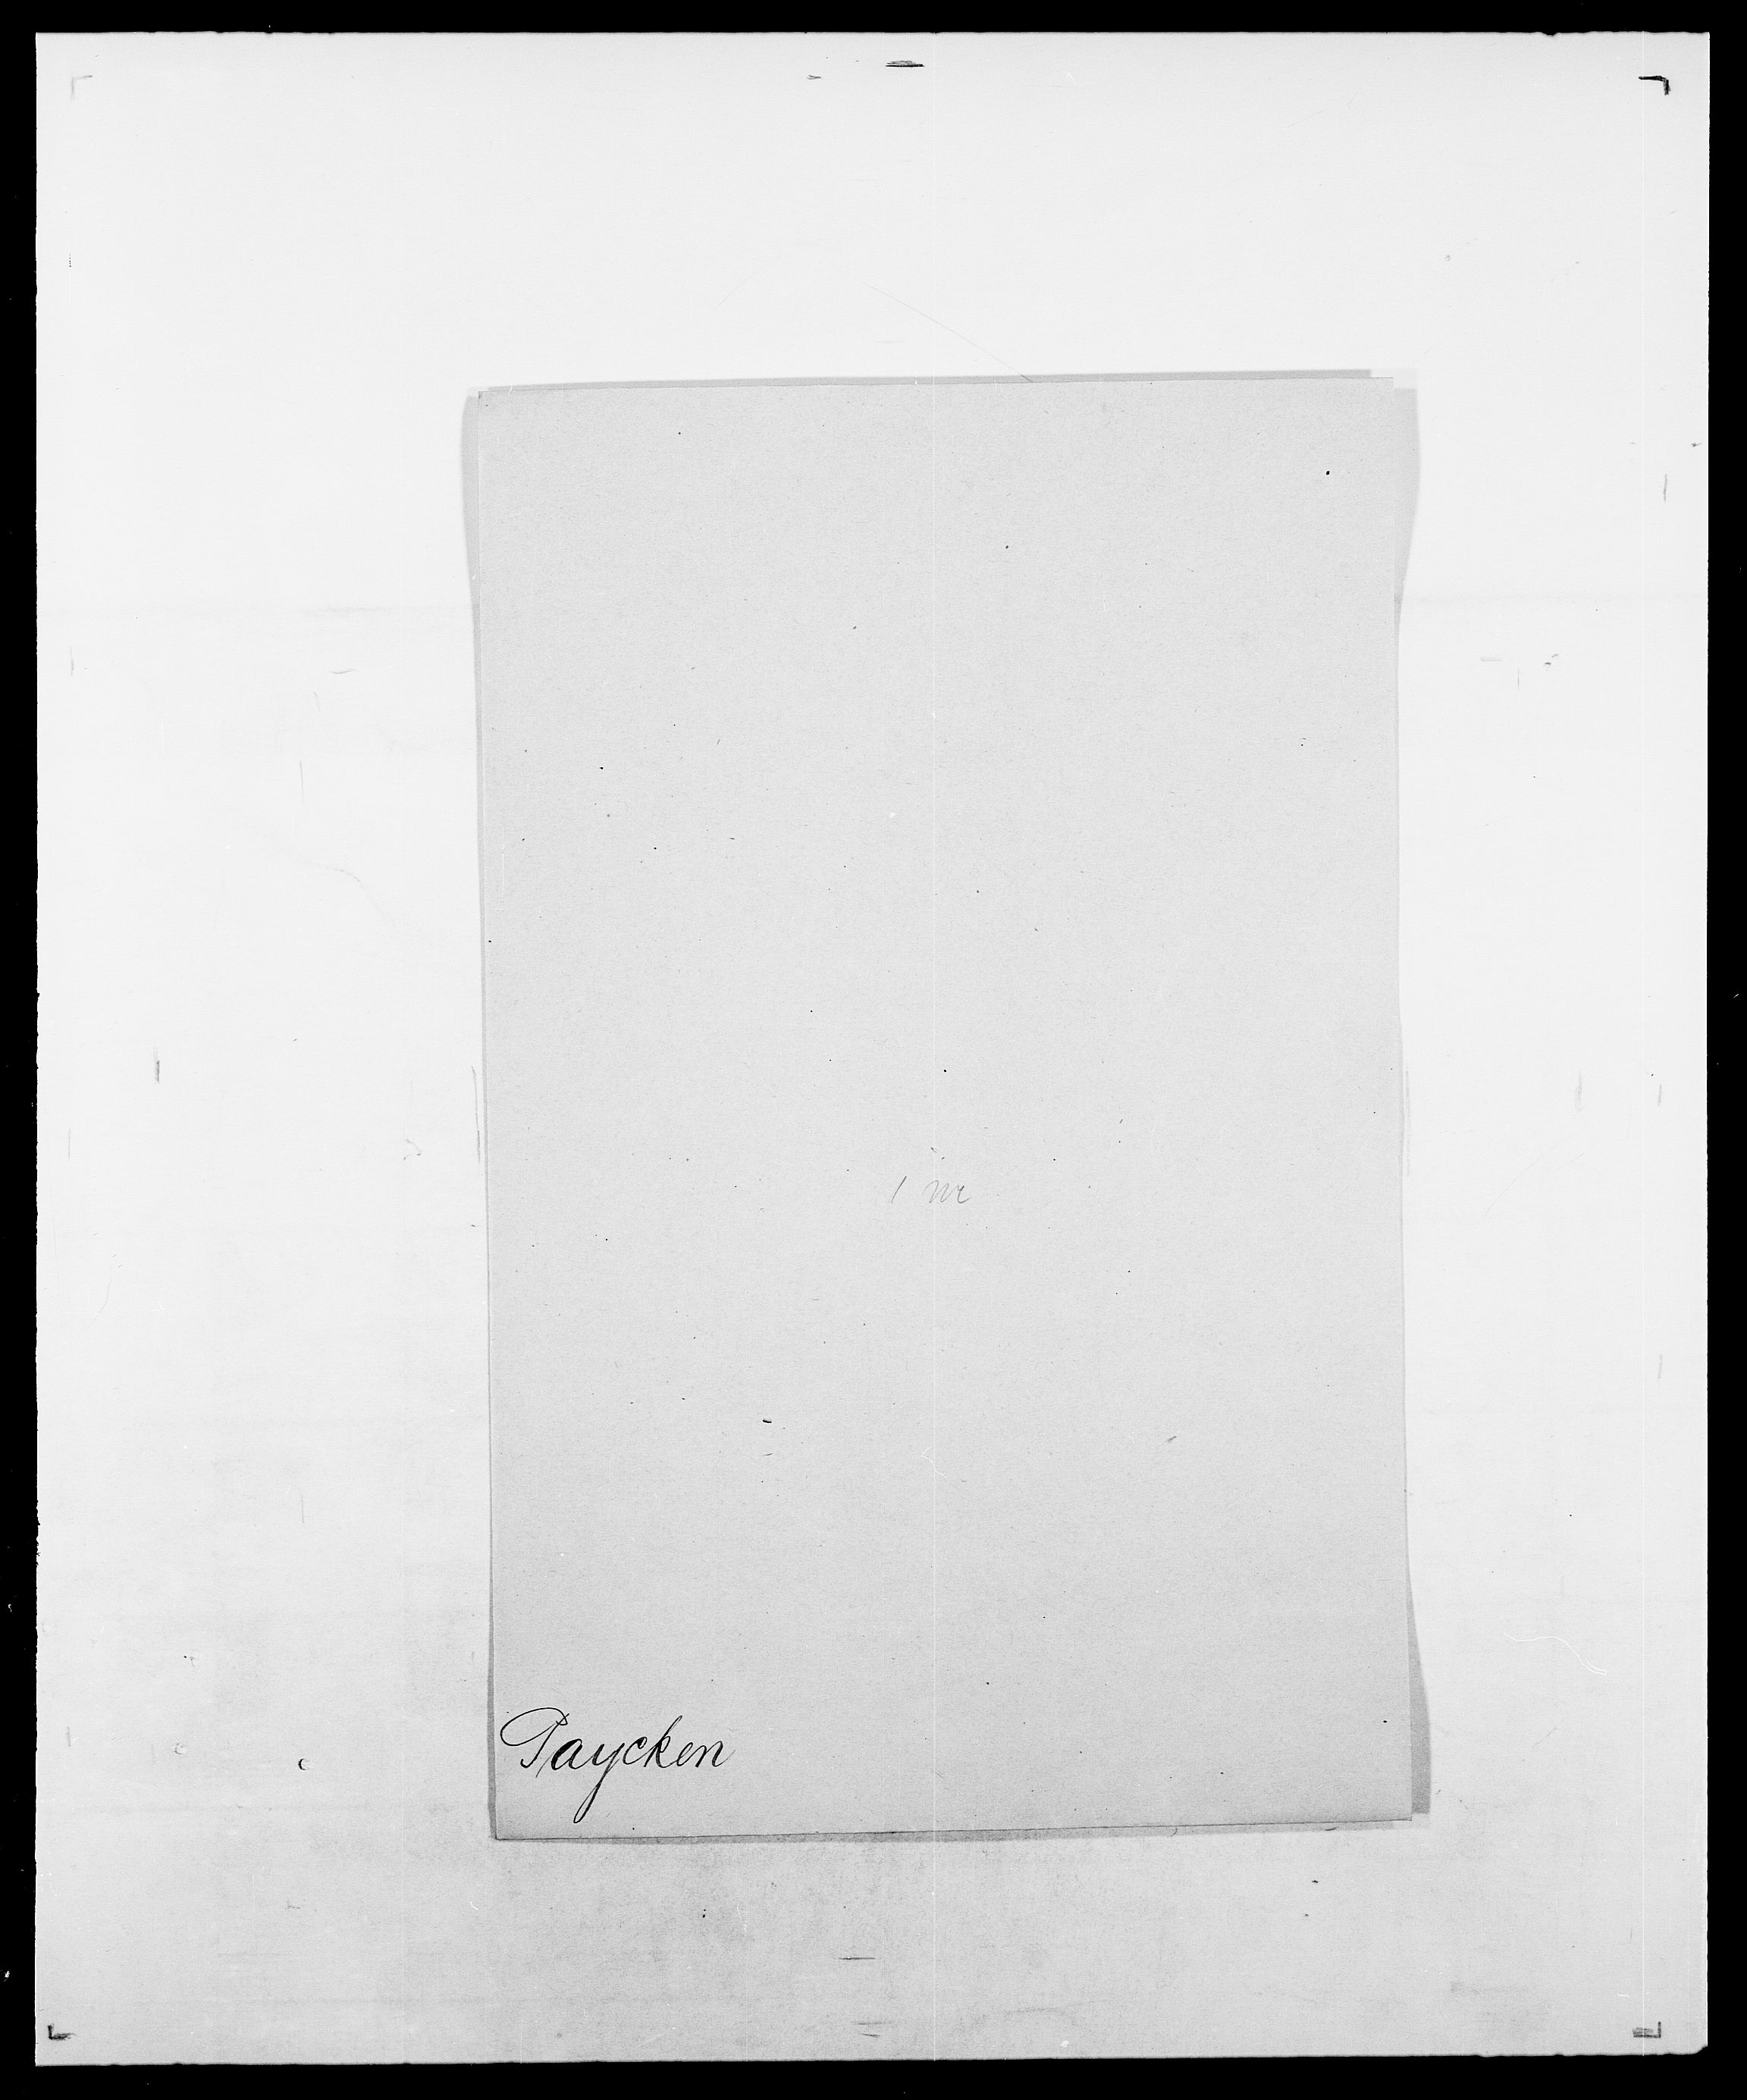 SAO, Delgobe, Charles Antoine - samling, D/Da/L0030: Paars - Pittelkov, s. 260